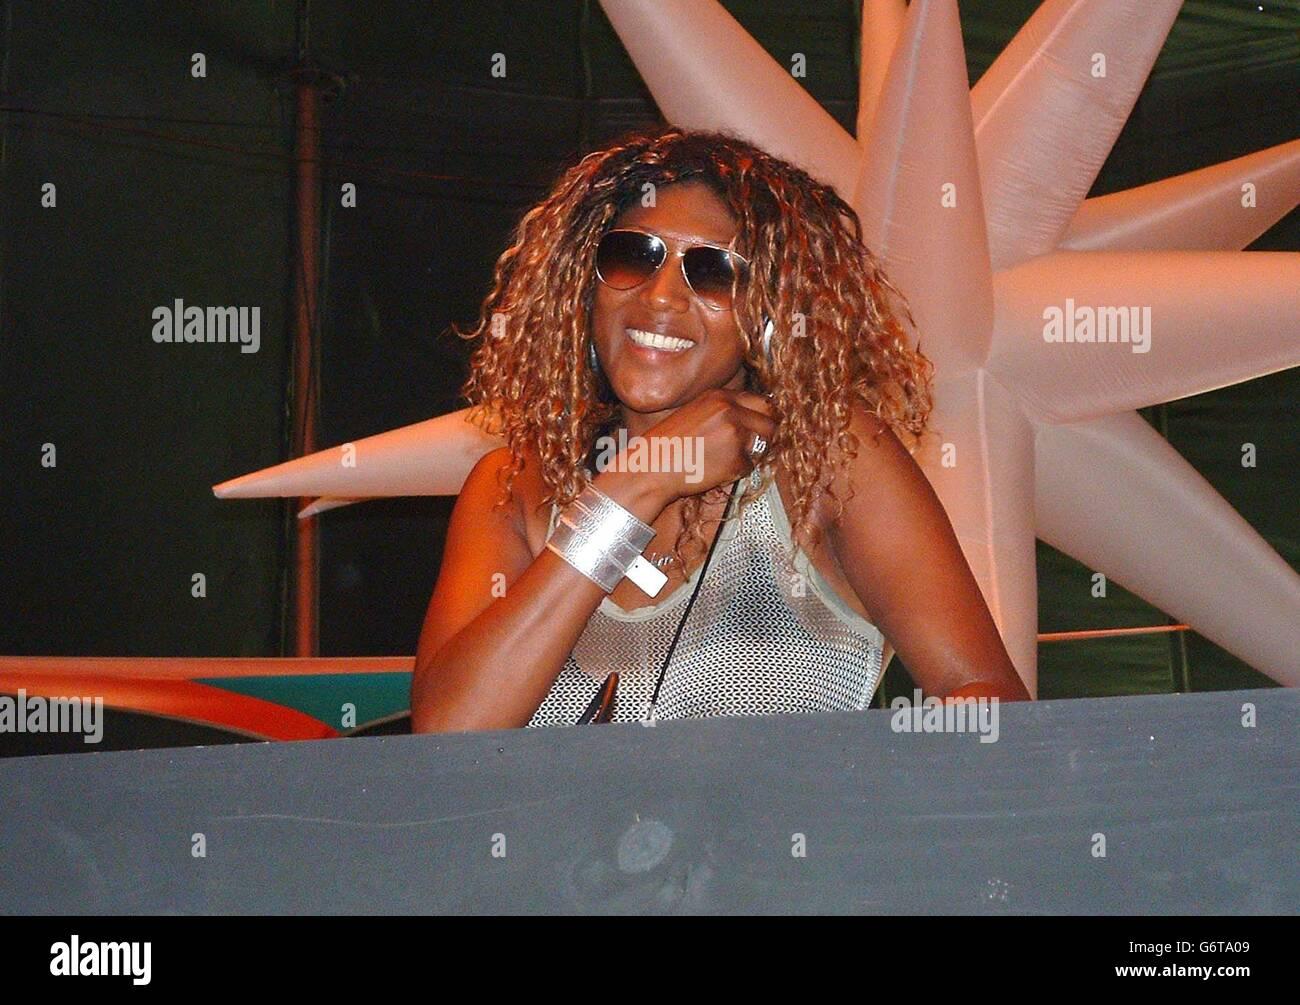 DJ Smokin Jo at Ultra Music Festival - Stock Image